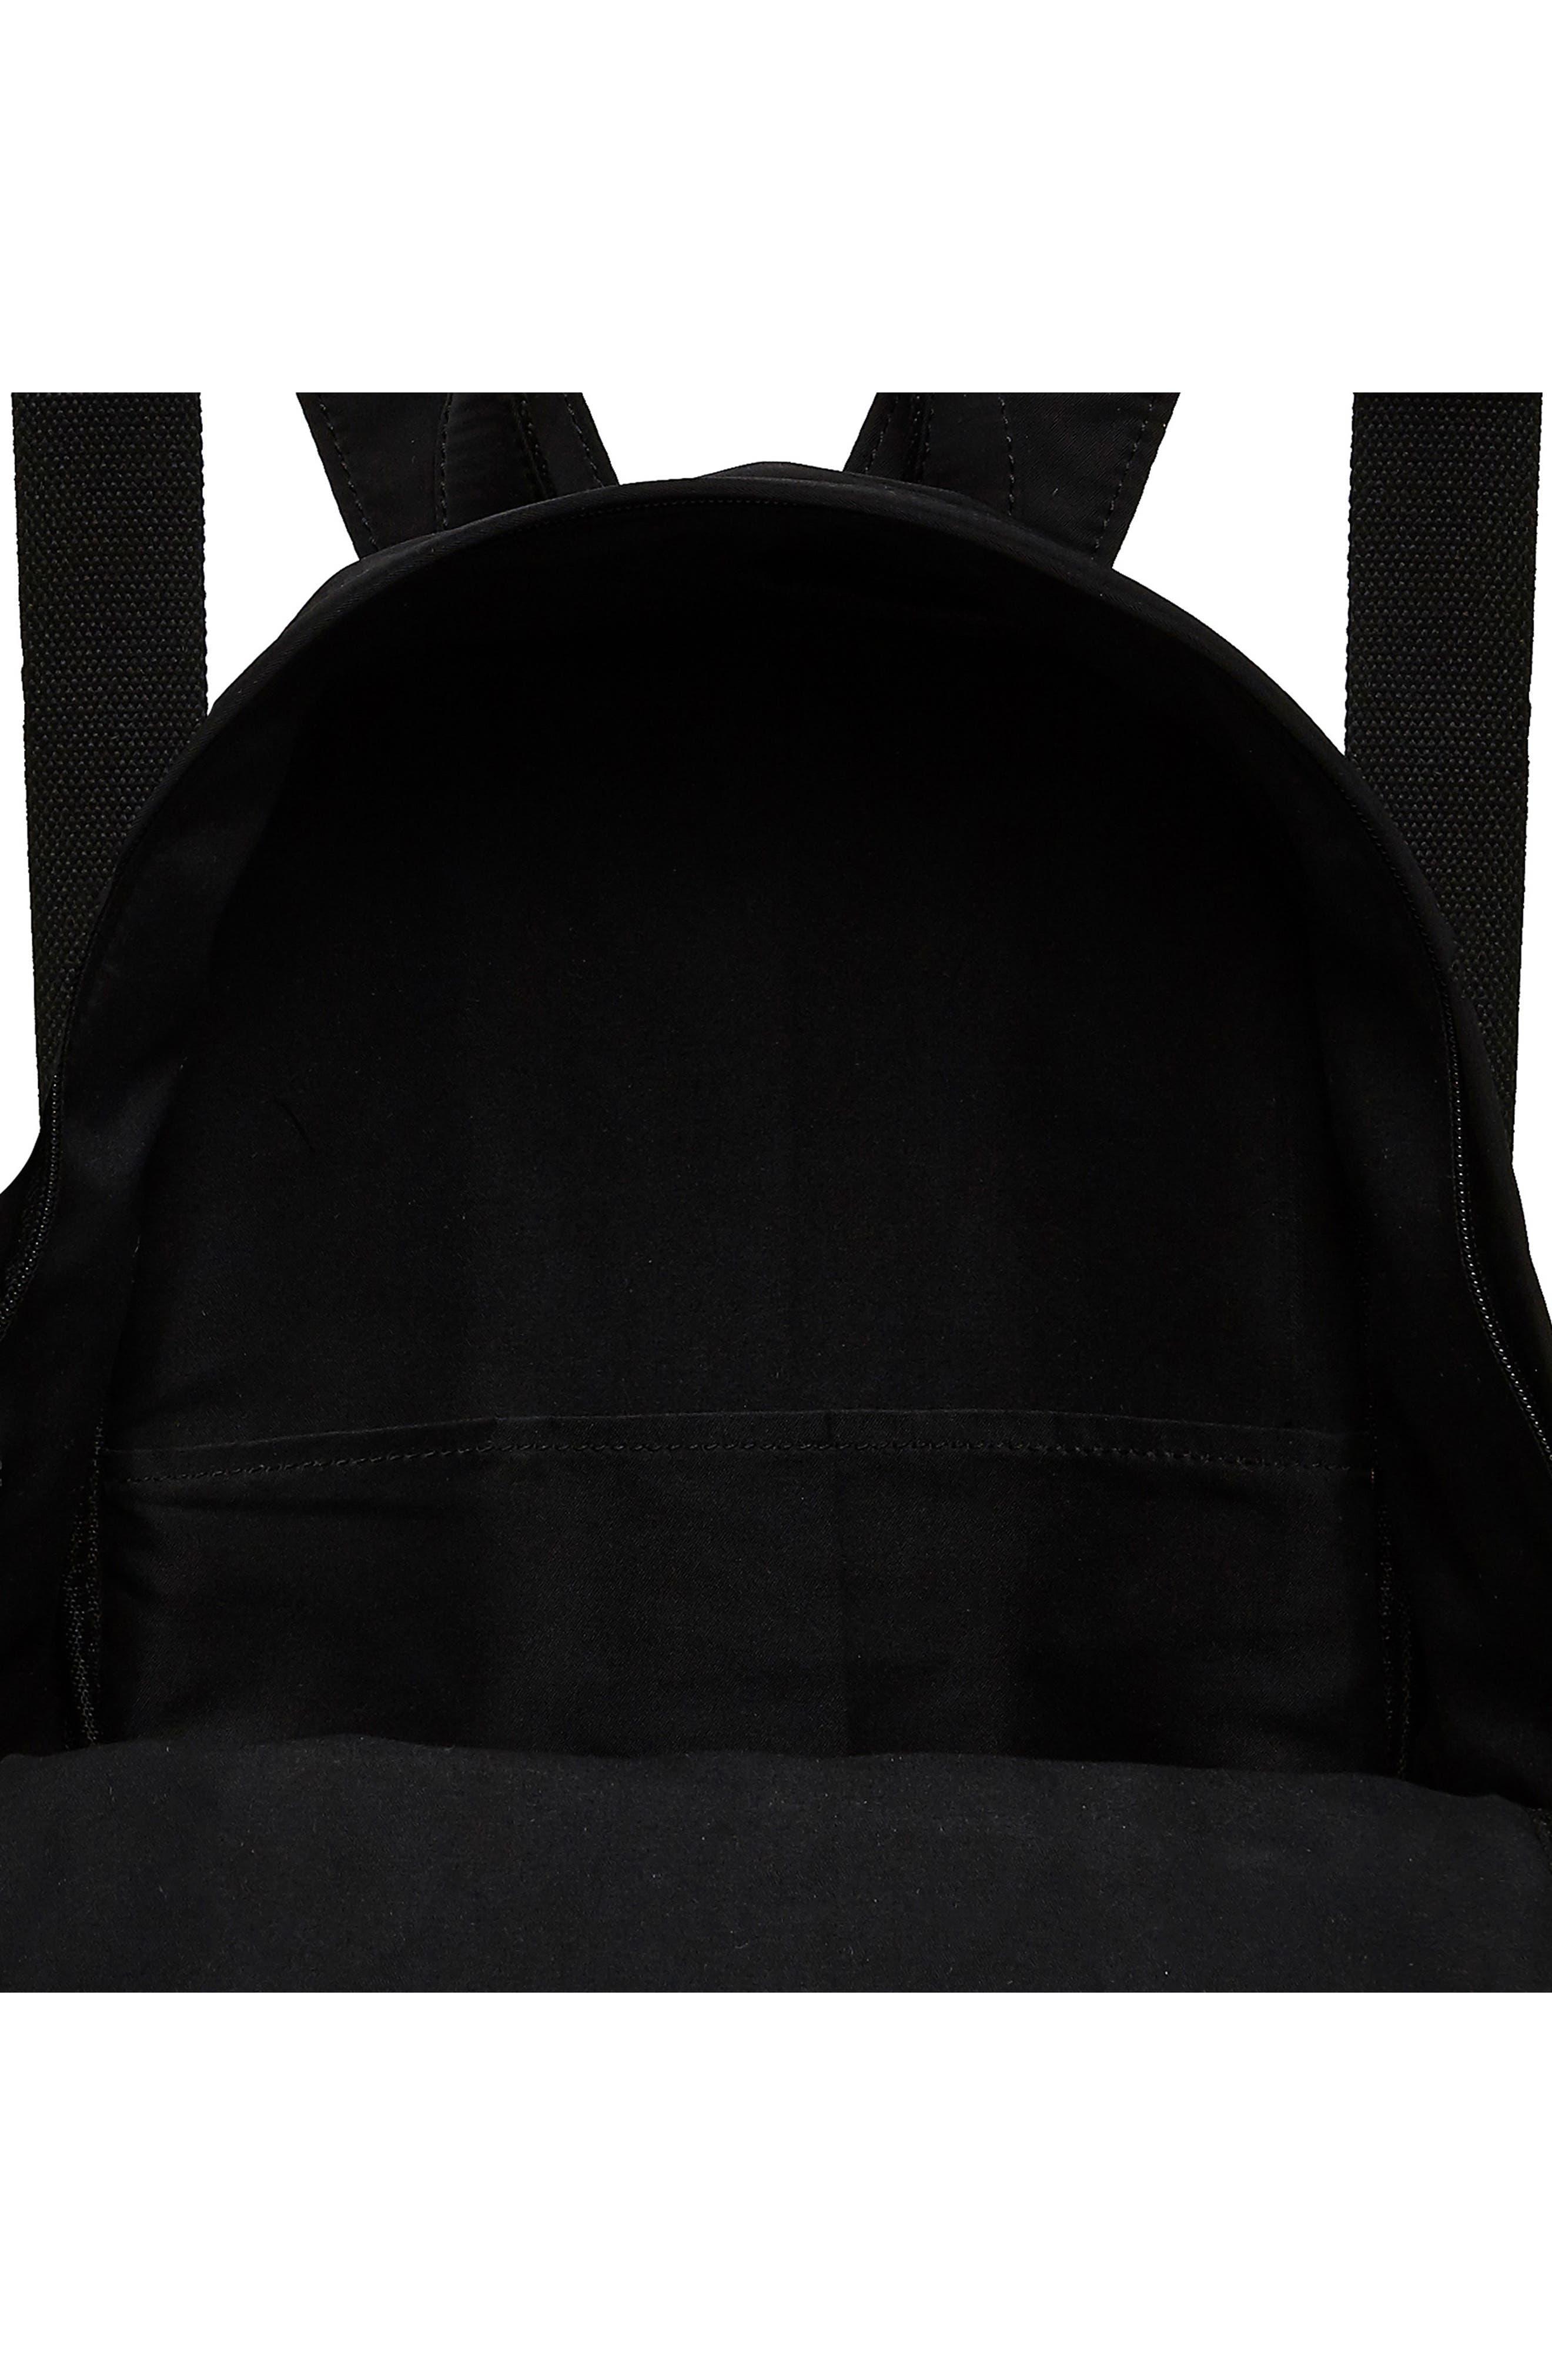 Alternate Image 3  - Urban Originals Own Beat Vegan Leather Backpack